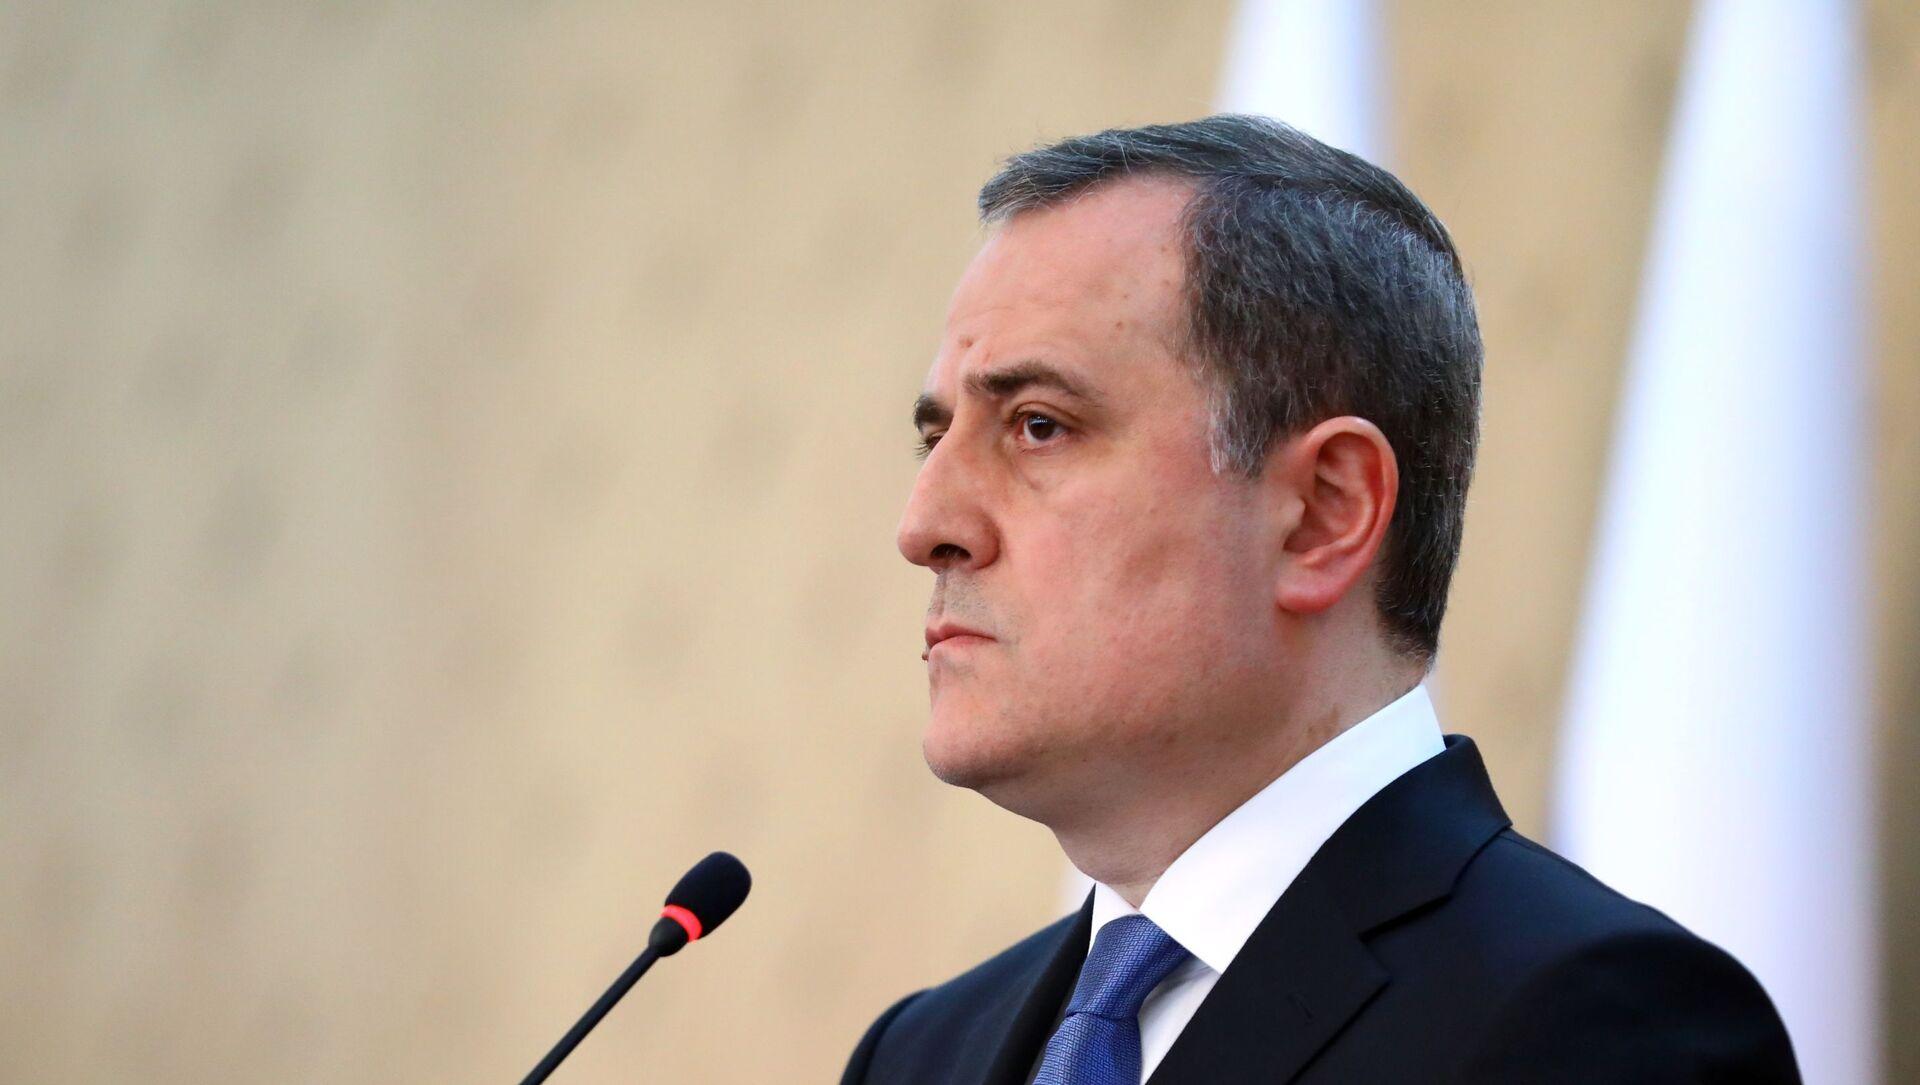 Глава МИД Азербайджана Джейхун Байрамов, фото из архива - Sputnik Азербайджан, 1920, 31.08.2021